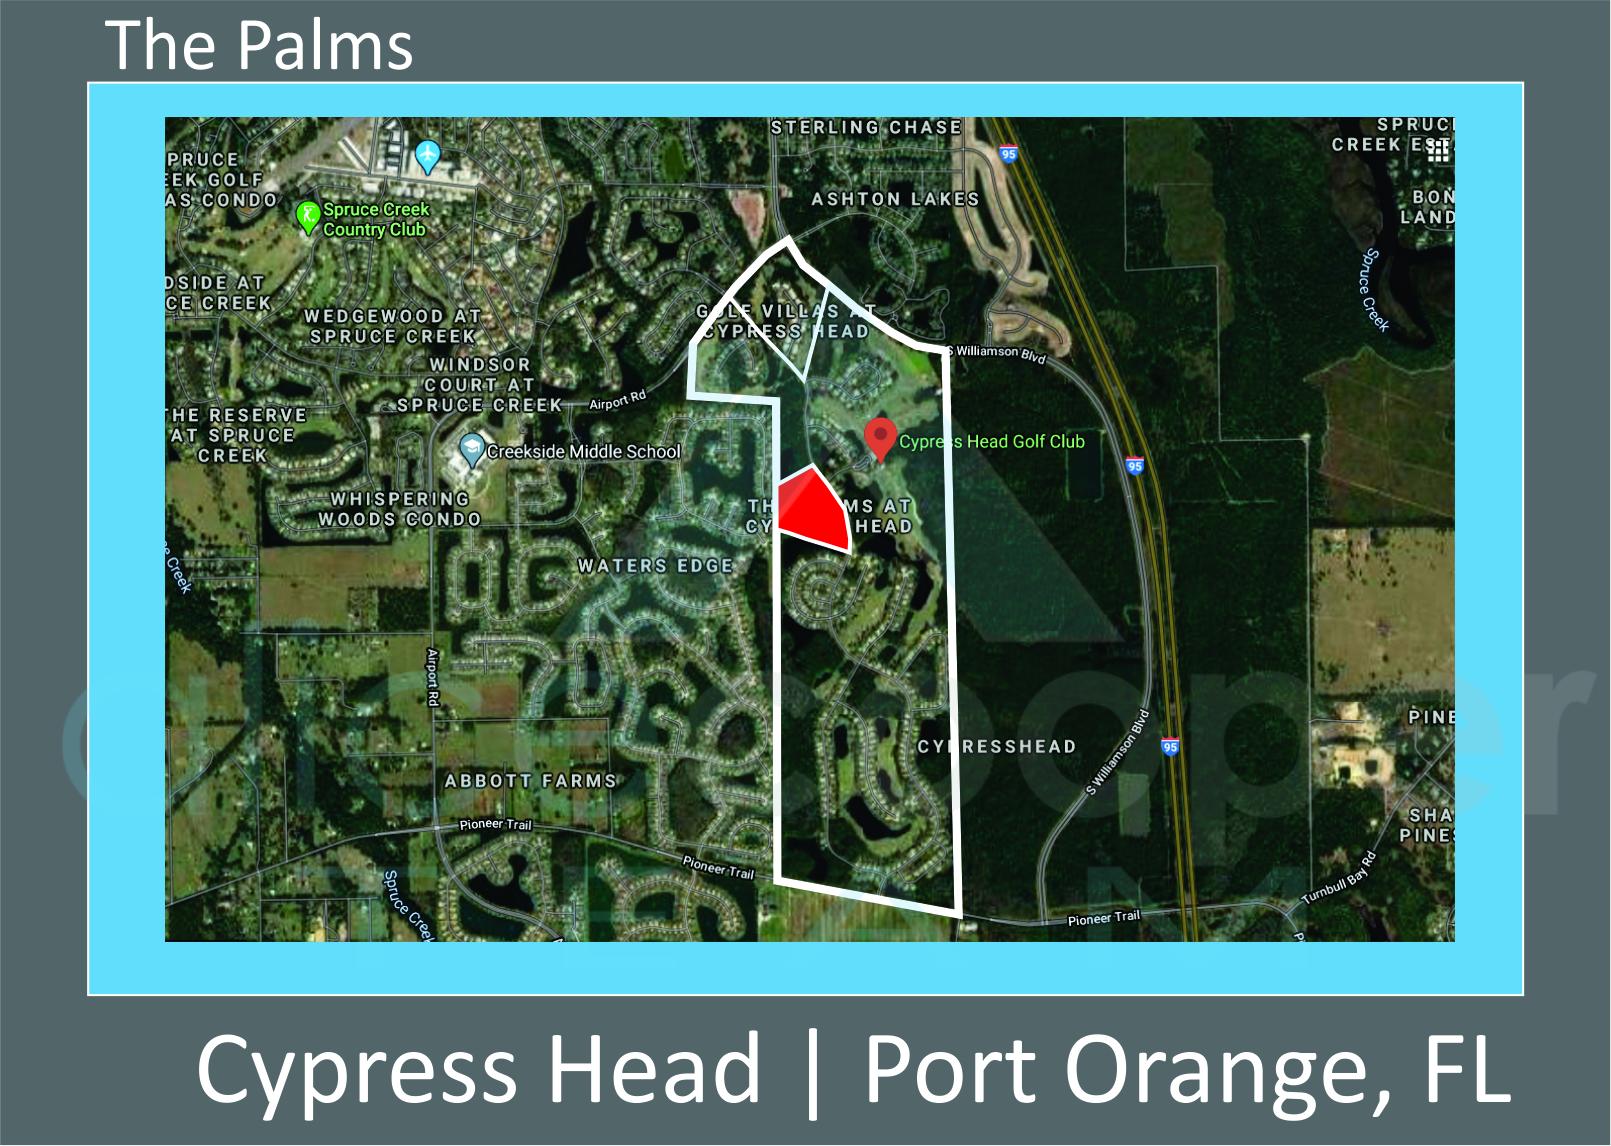 Map of Cypress Head The Palms Port Orange FL